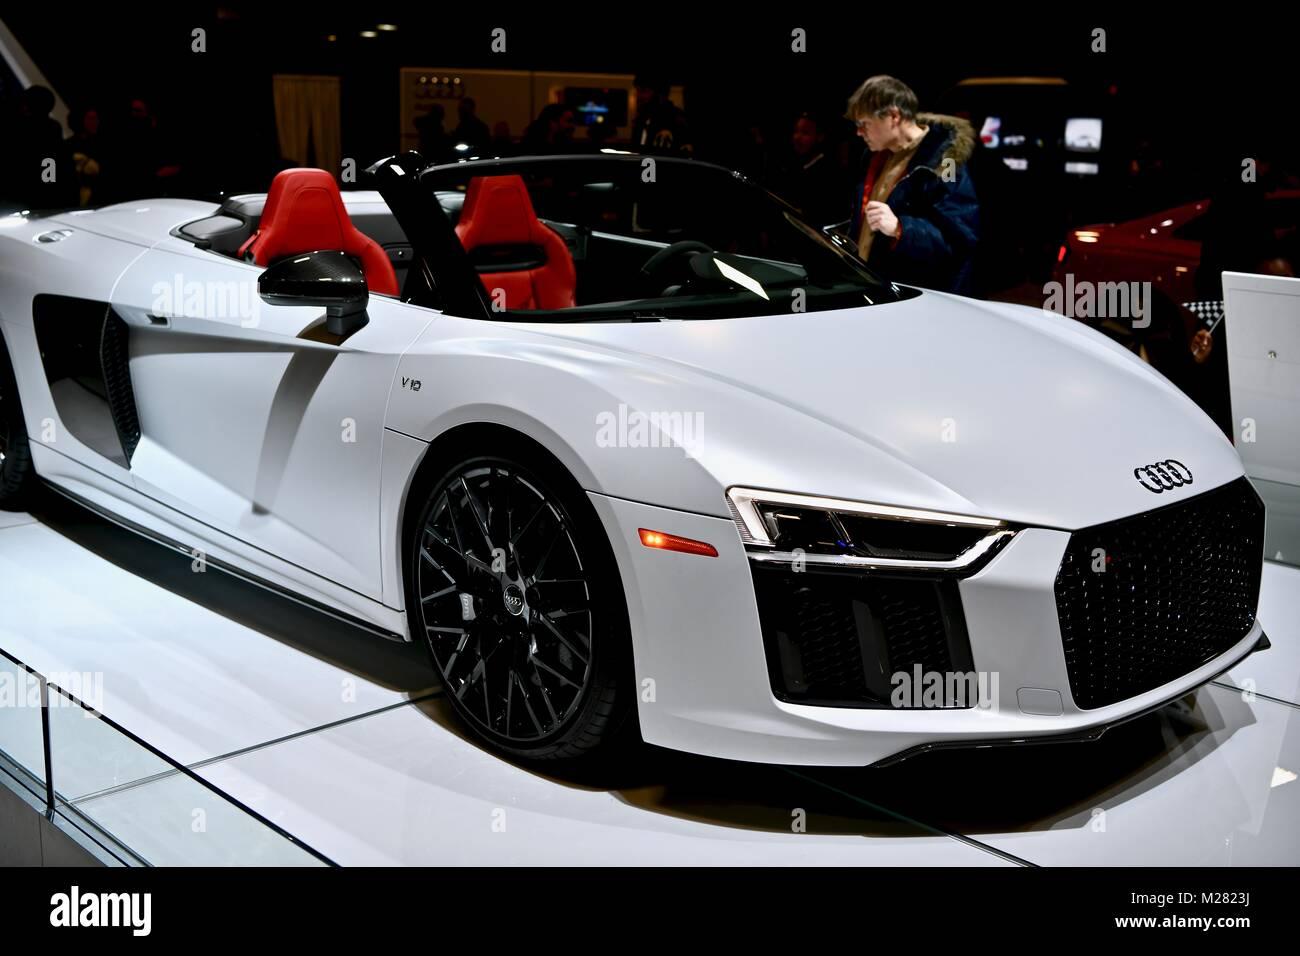 2018 Audi R8 Spyder at the 2018 Washington Auto Show, Washington DC